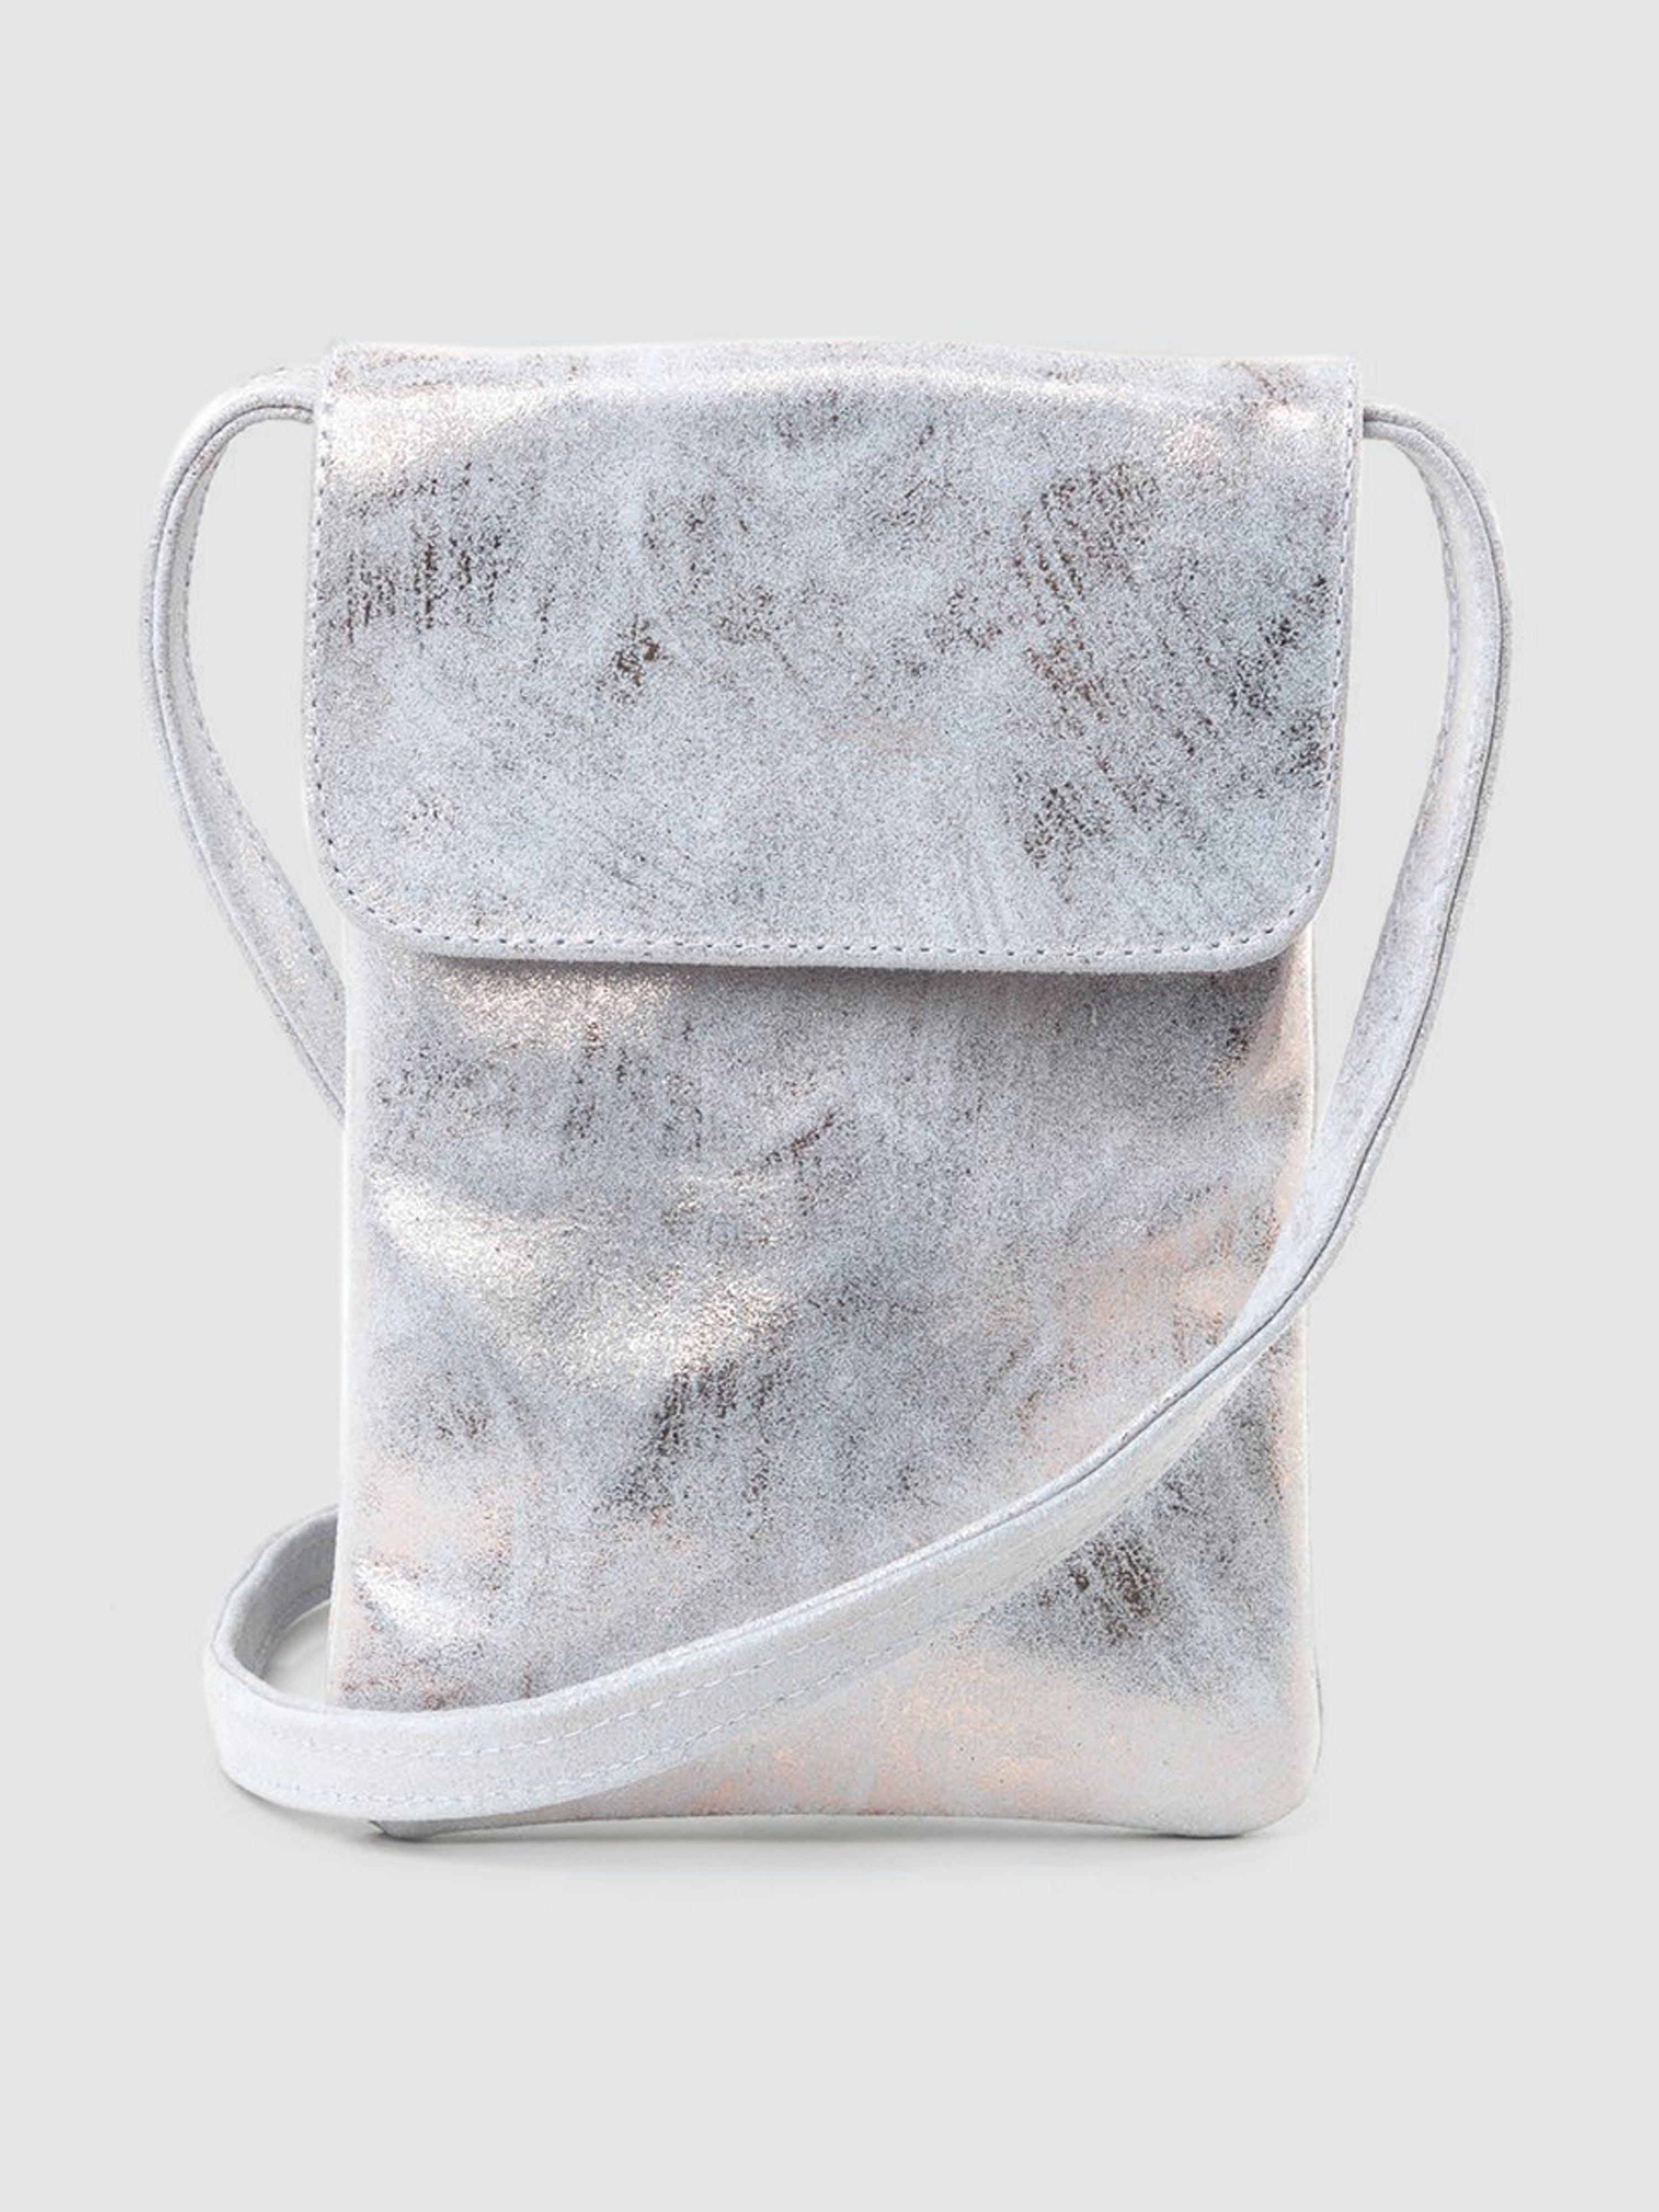 CoFi Leathers Penny Phone Bag: Rose Gold White  - White